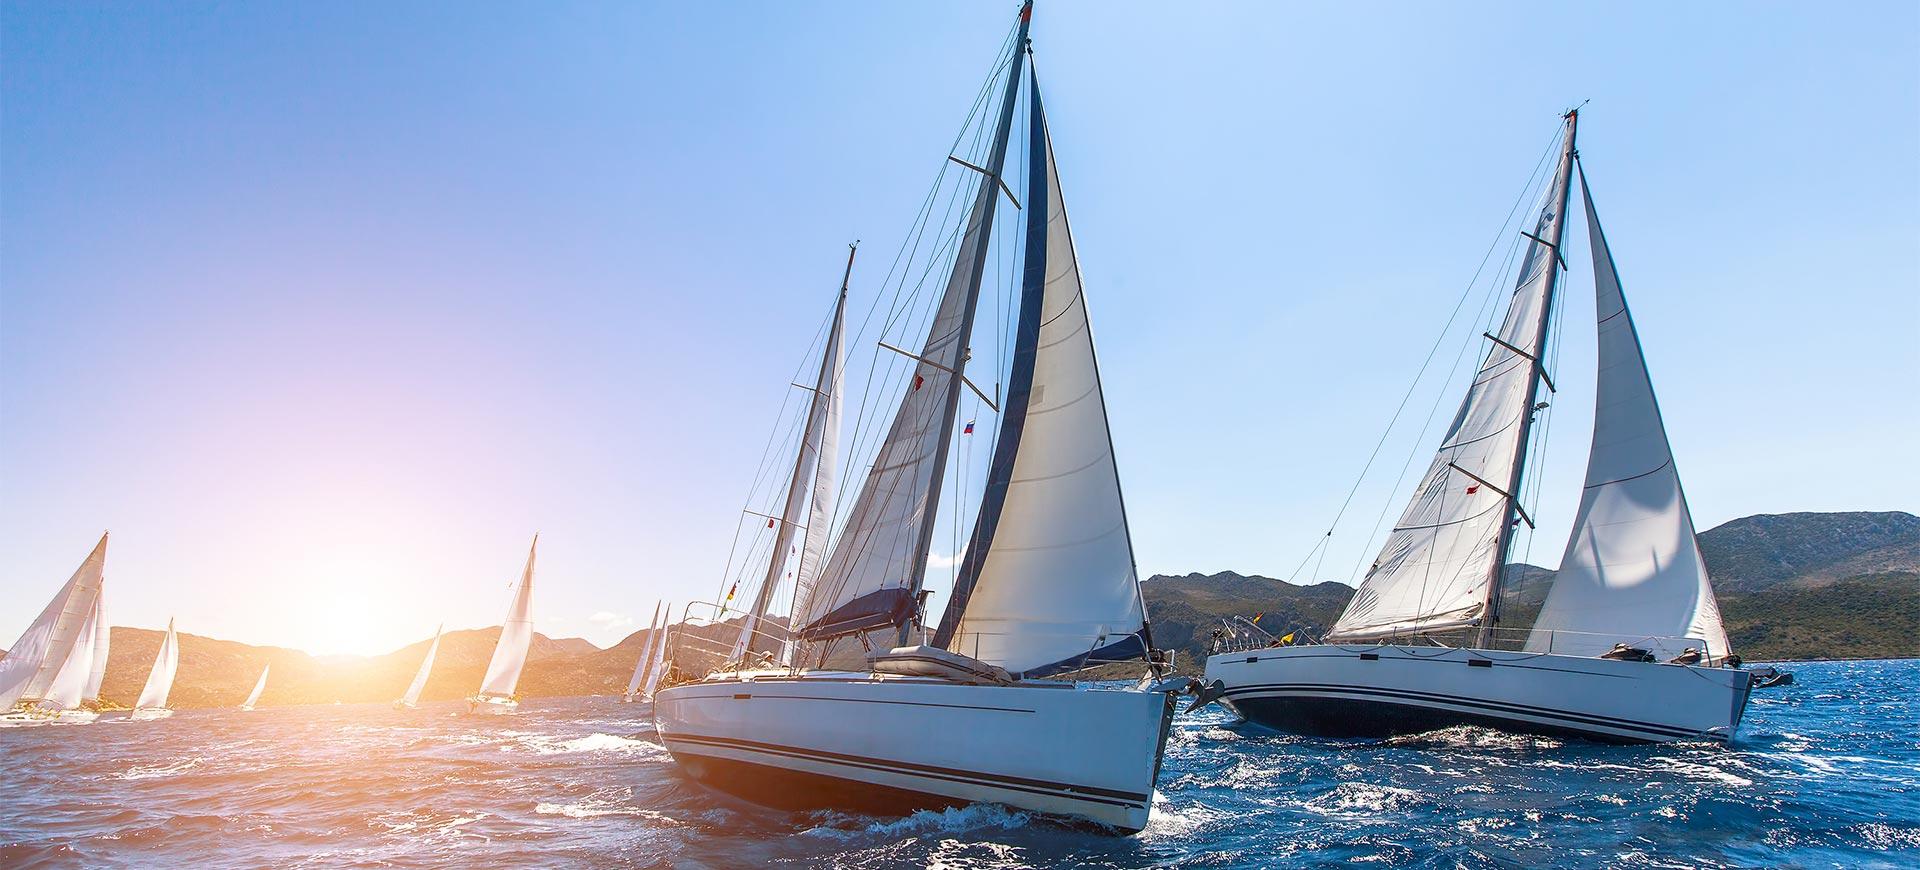 Noa Yachting Reinigungsstandards